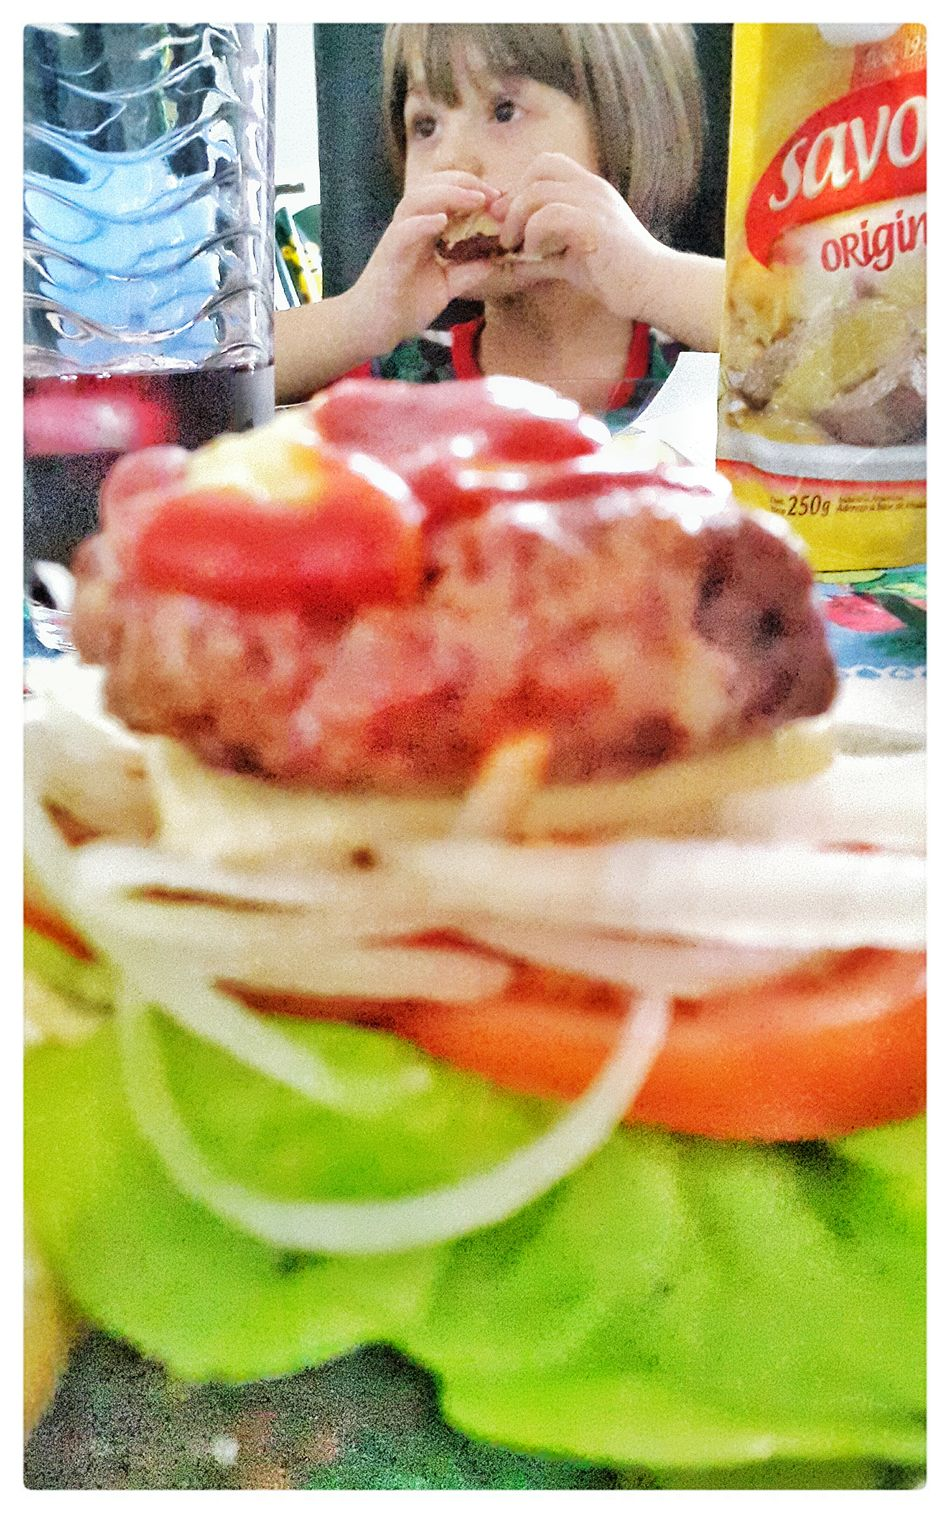 Niña comiendo hamburguesa Kids Eating Food Hamburger Burguers Food Photography Meat! Meat! Meat! Hamburguesas Caseras Foodpics Hamburguesas Foodphotography Meat